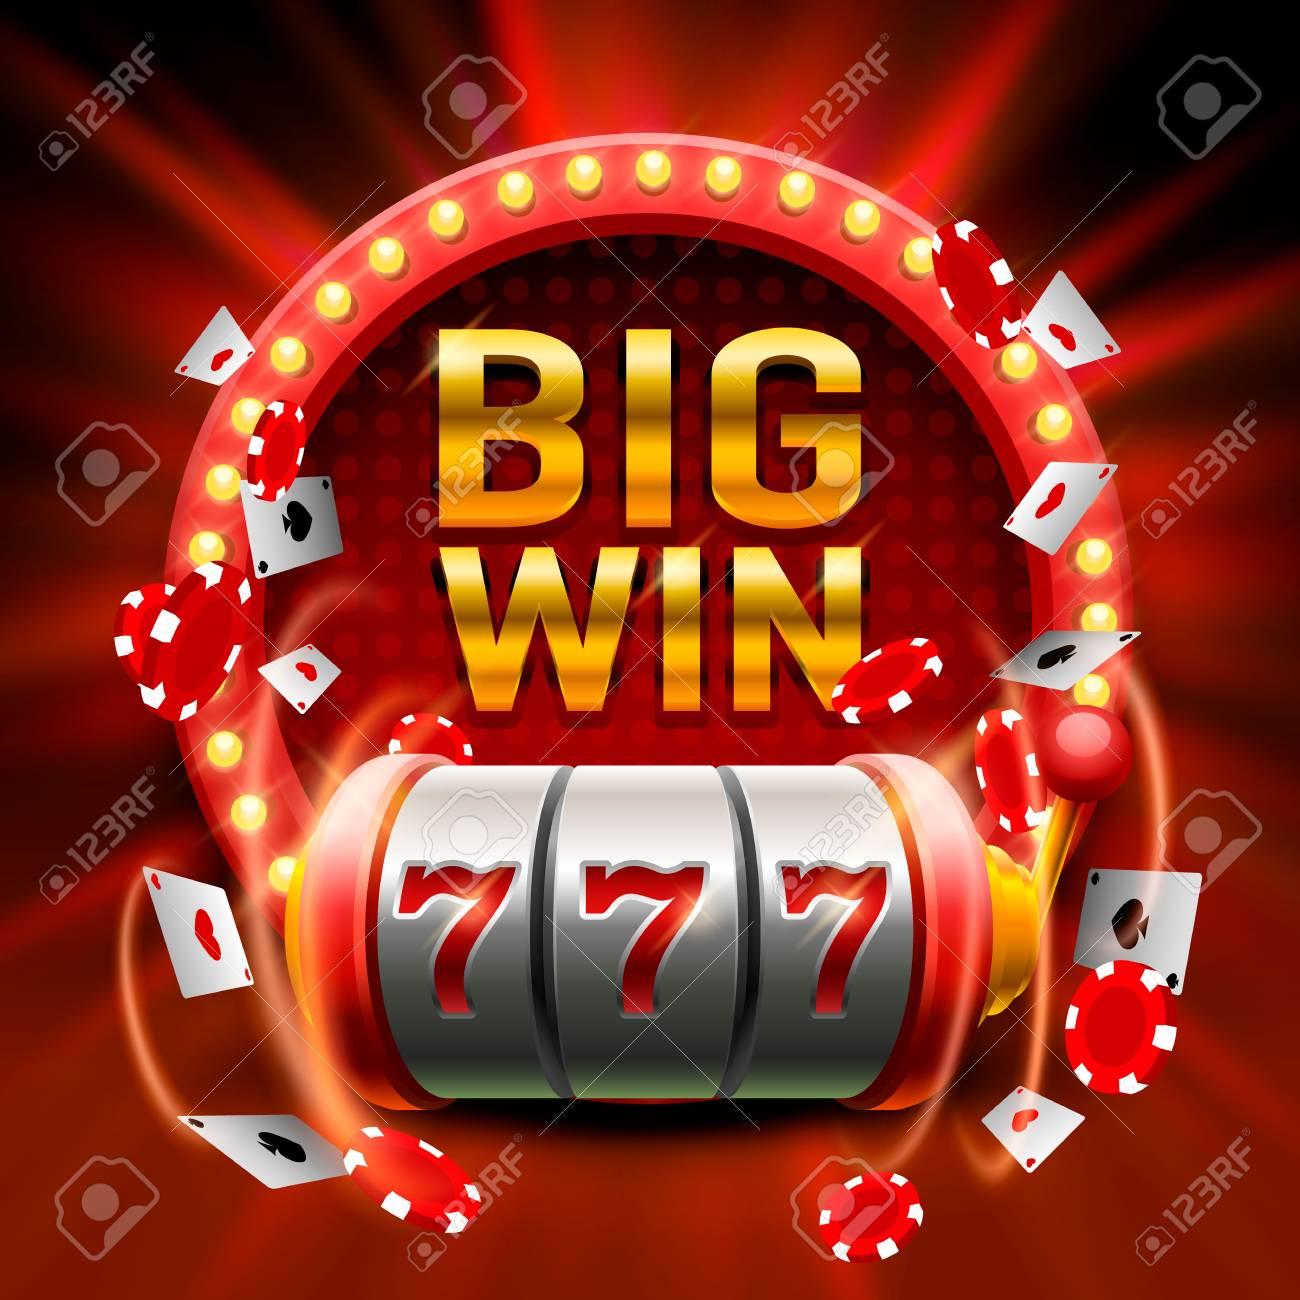 Big Win Slots 777 Banner Casino Royalty Free Cliparts Vectors And Stock Illustration Image 85929866